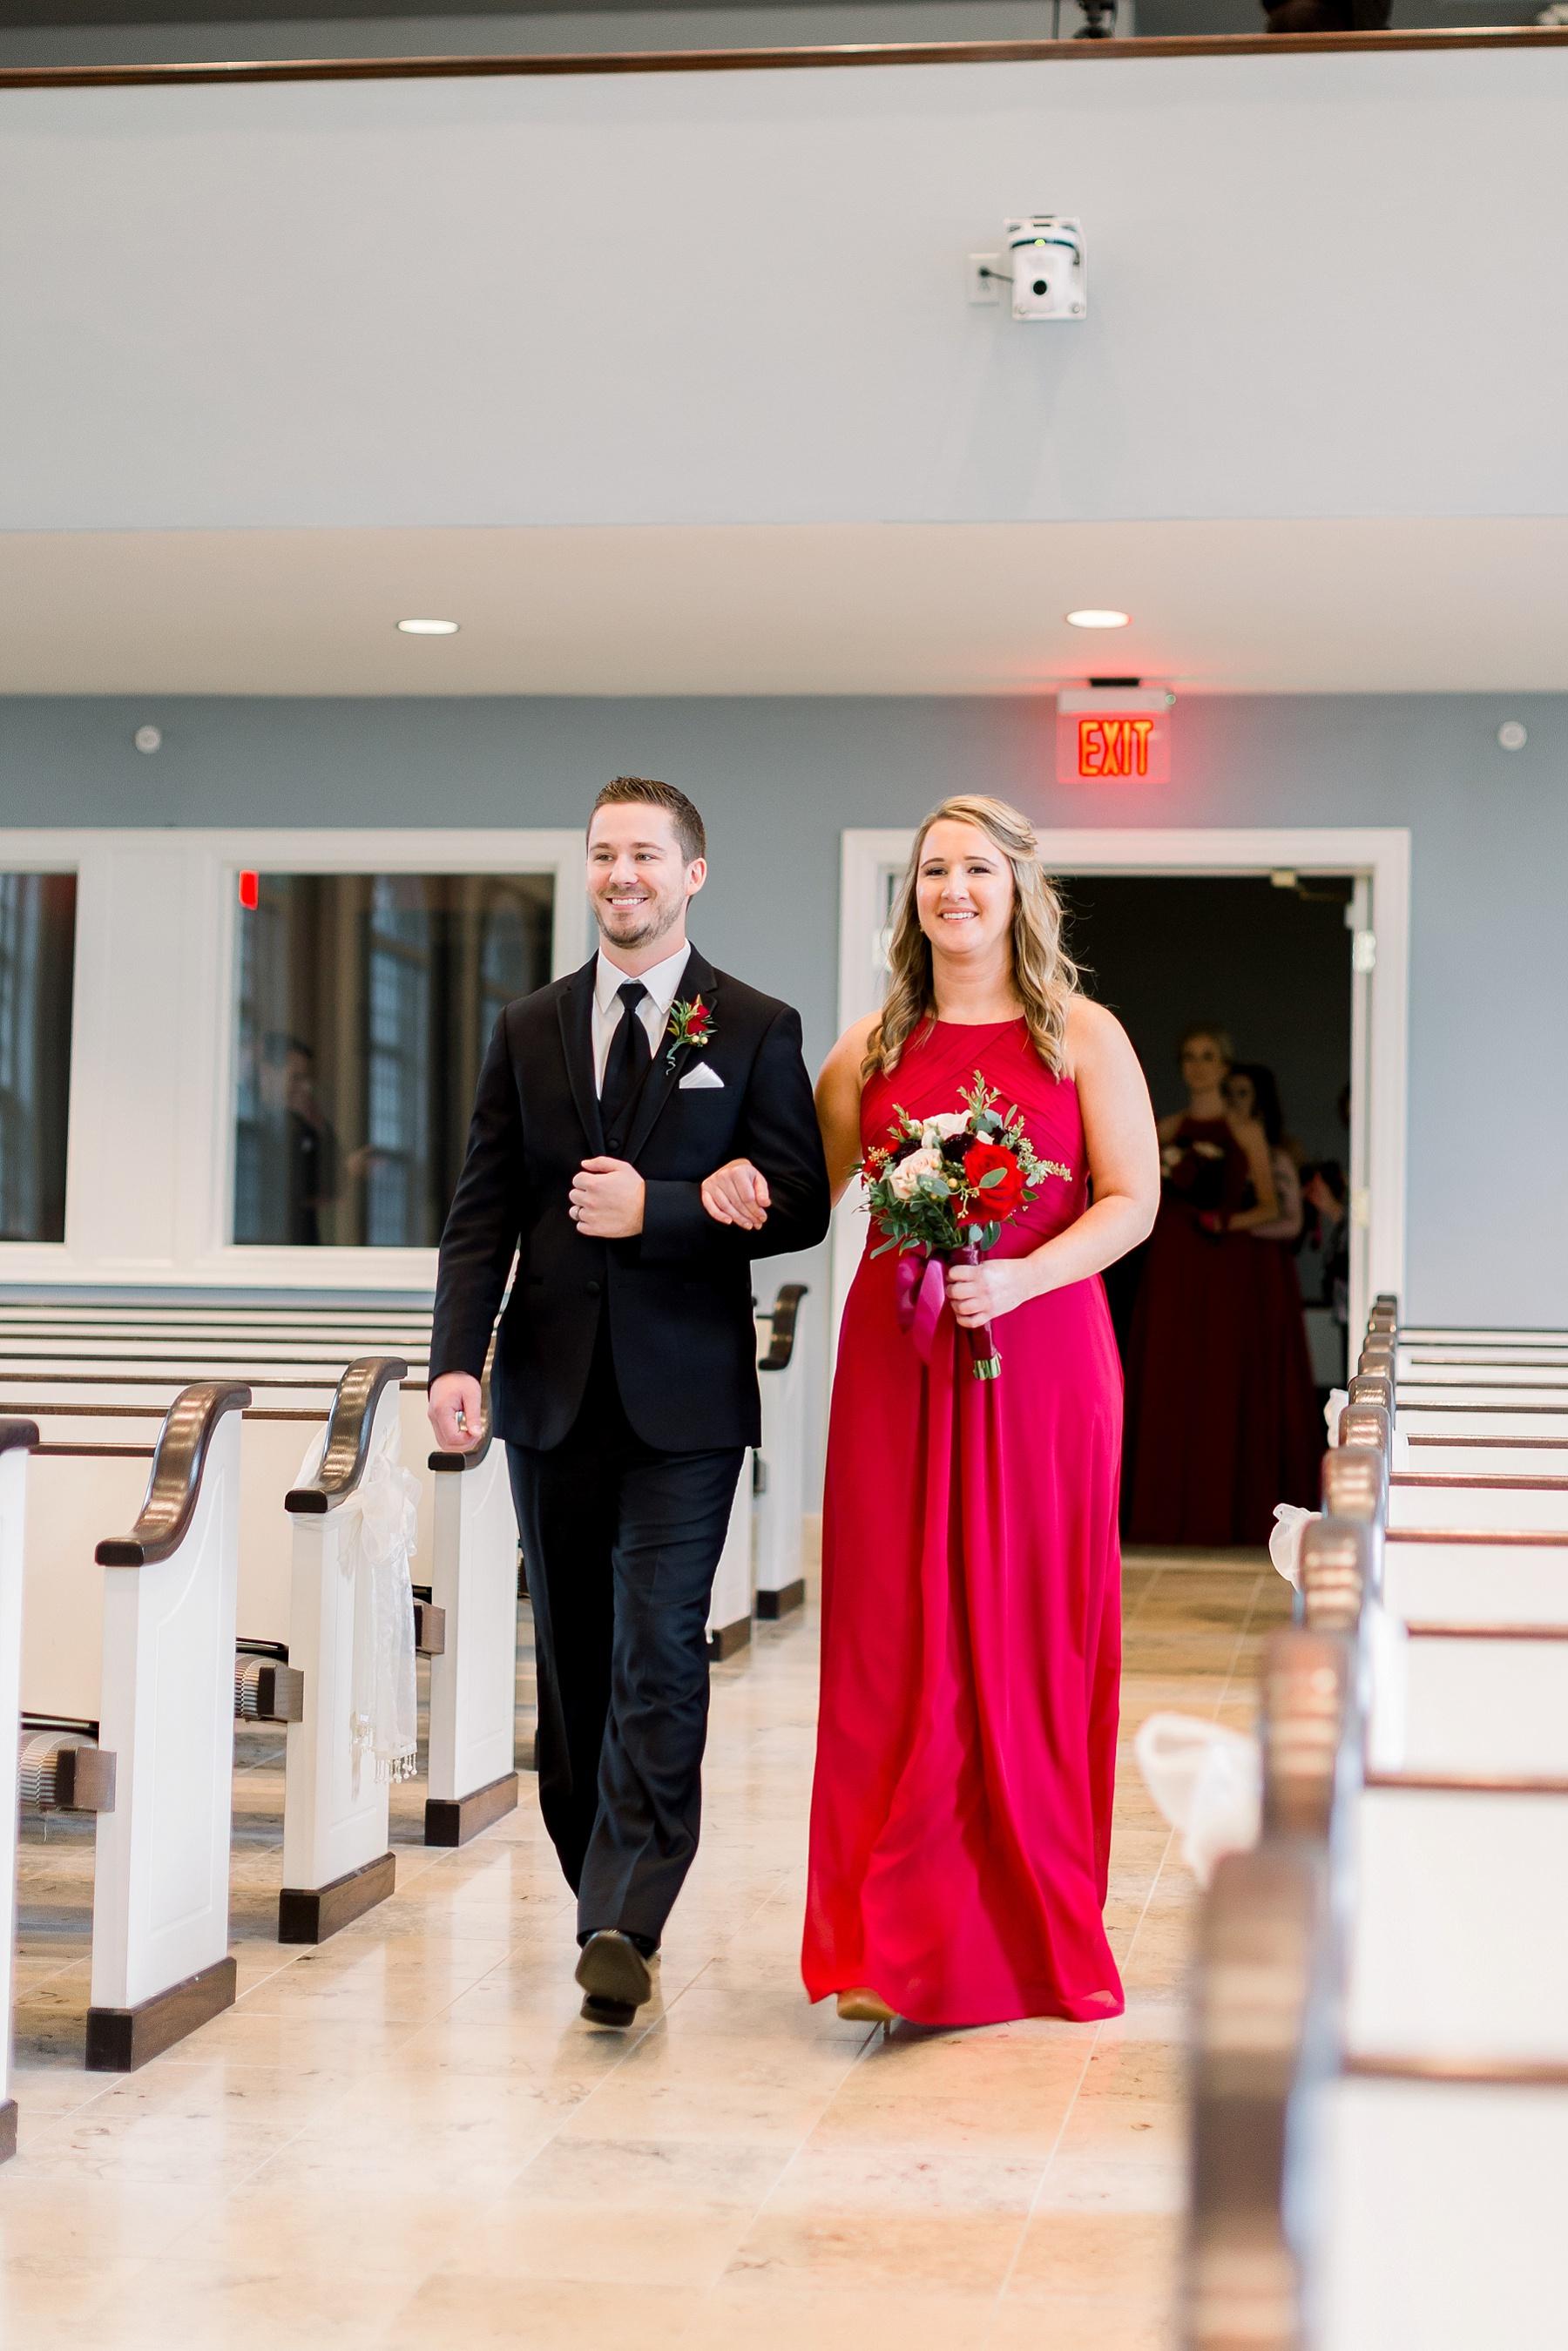 midwest-adventurous-wedding-photographer-elizabeth-ladean-photography-photo_4746.jpg